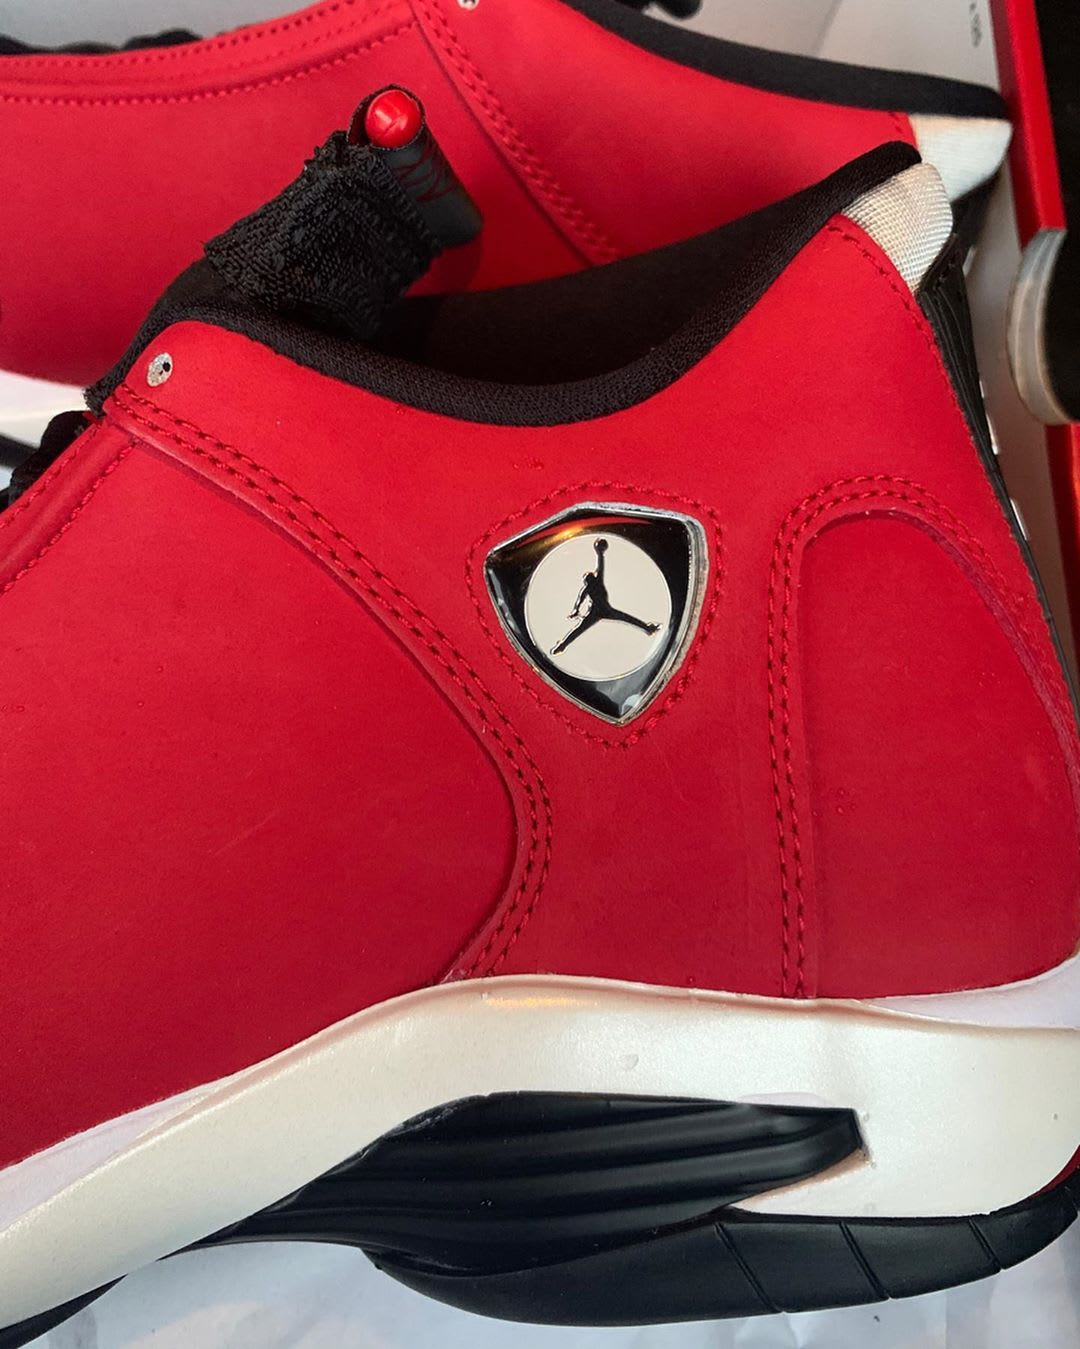 Air Jordan 14 Retro 'Gym Red' 487471-006 Heel